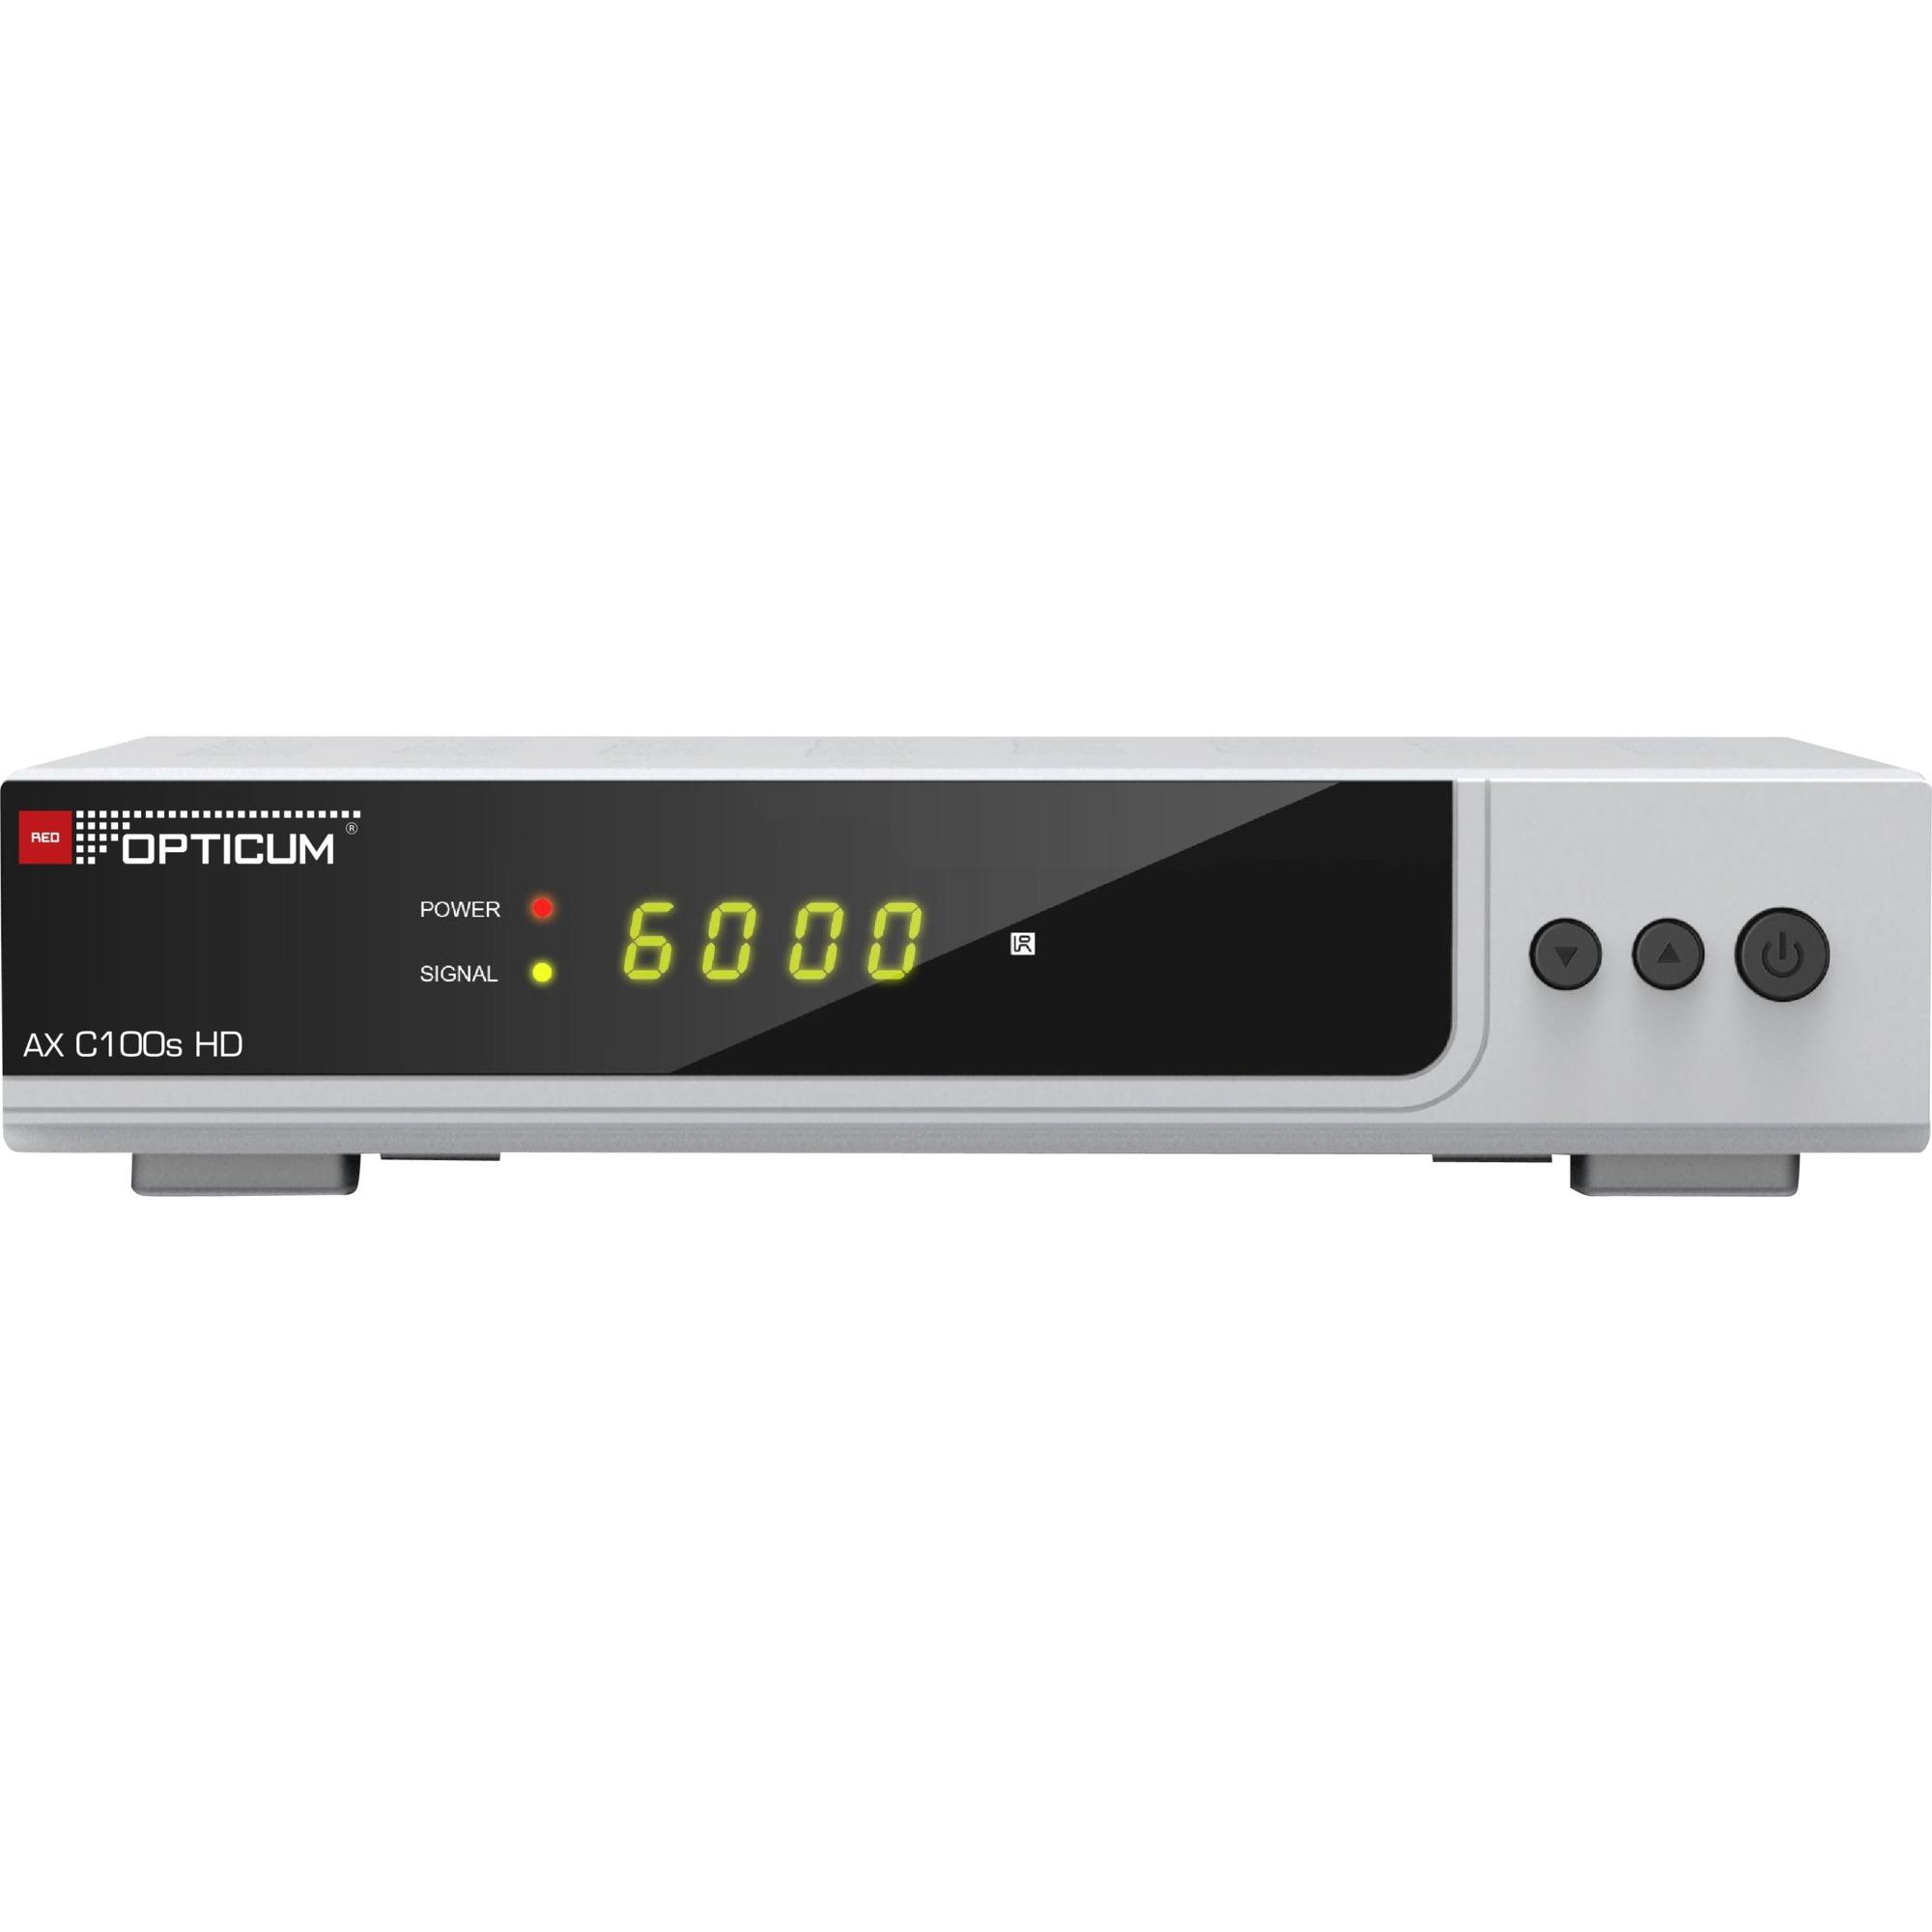 AX HD C100s tV set-top boxes Cable Alta Definición Total Plata, Receptor de cable